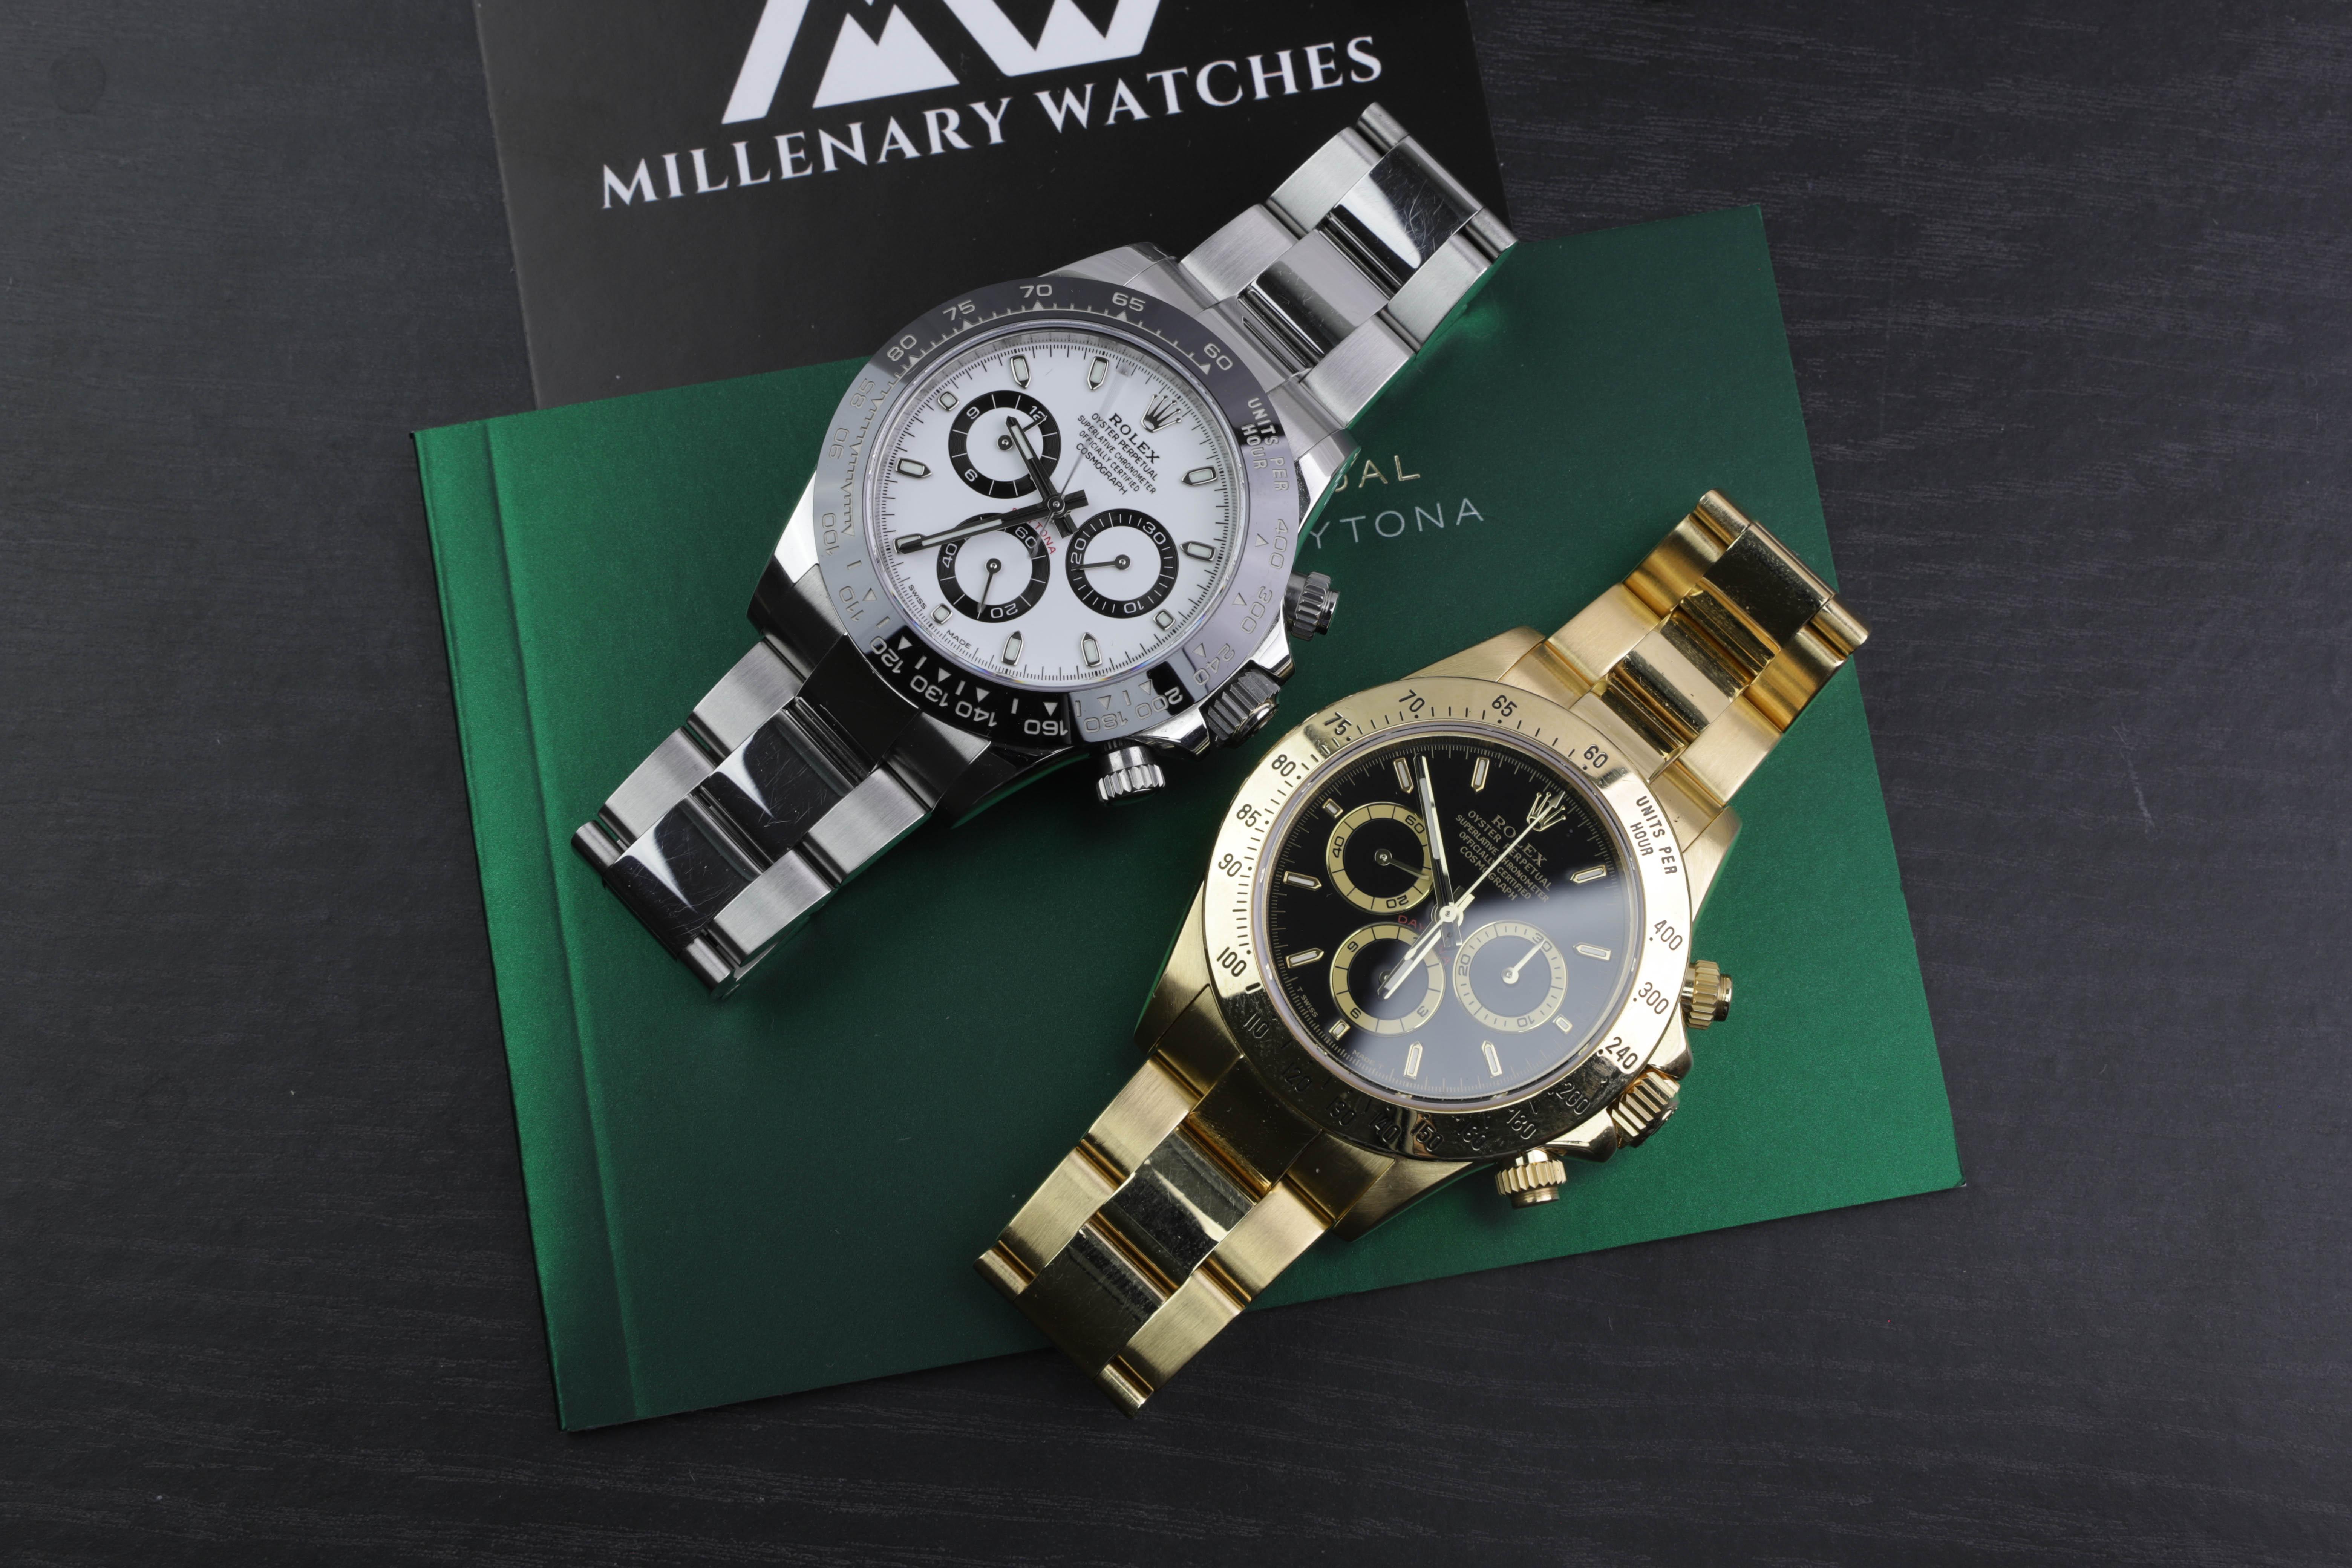 Rolex Daytona Ceramic 116500 White Dial Millenary Watches